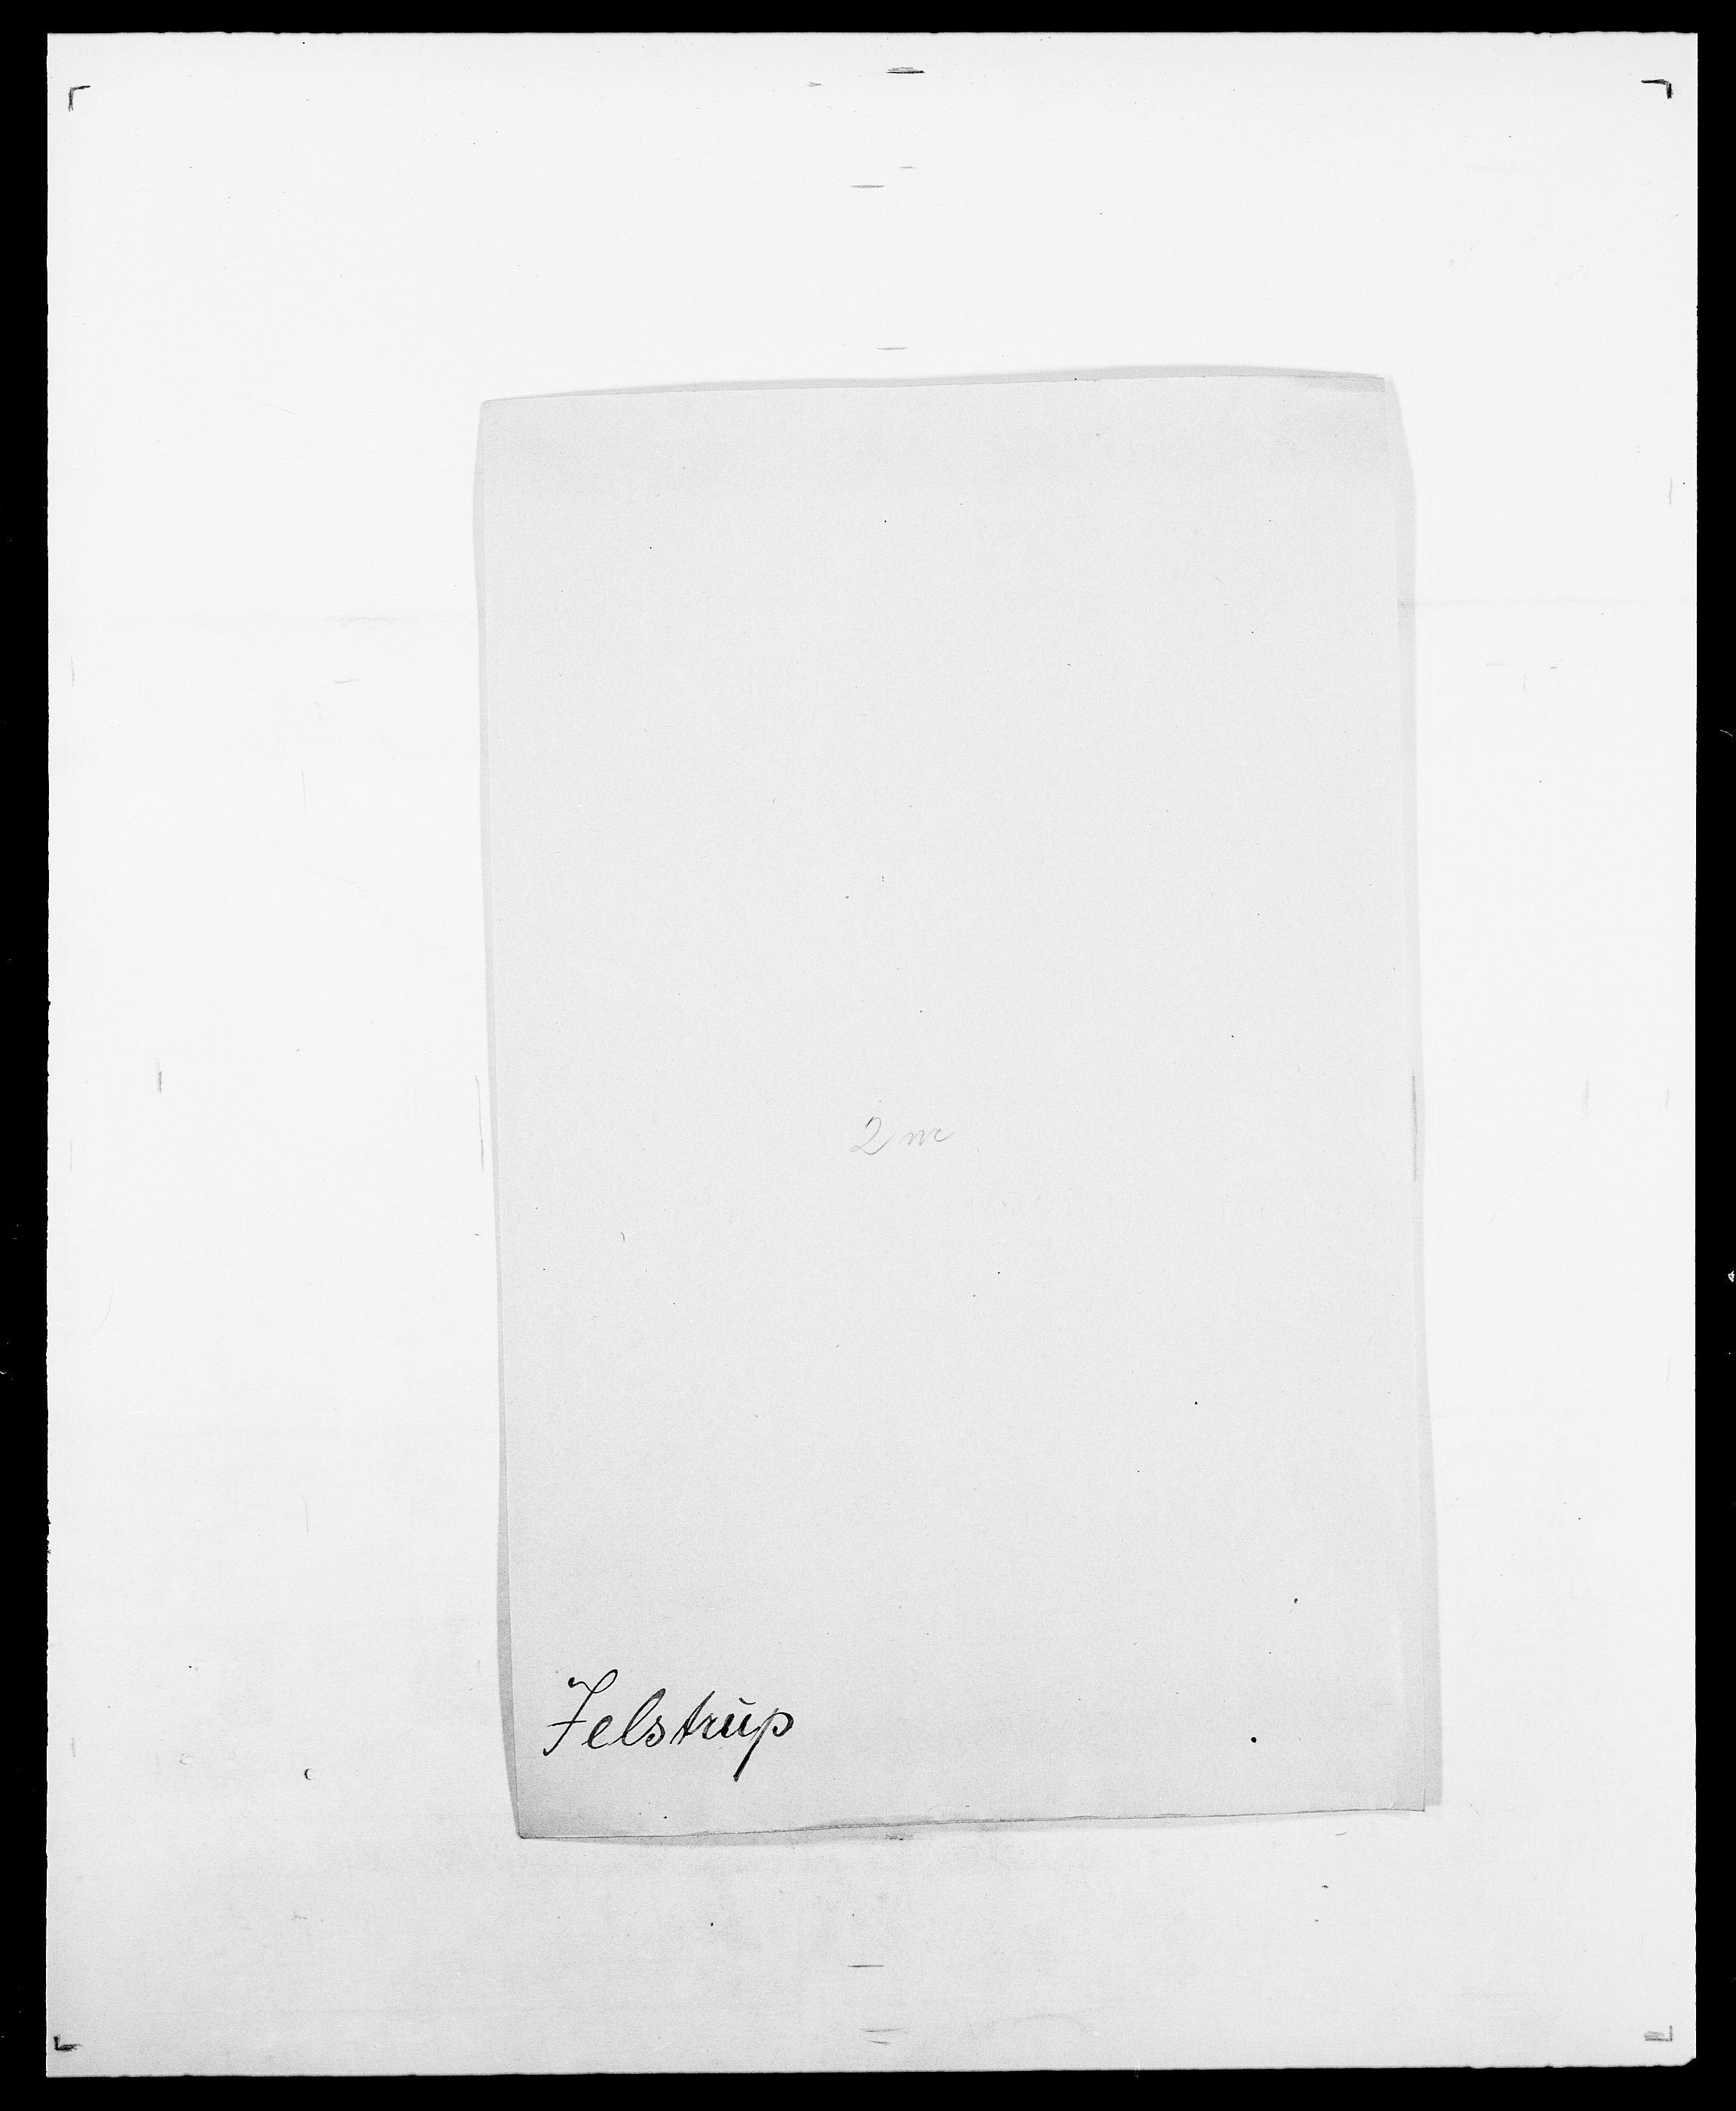 SAO, Delgobe, Charles Antoine - samling, D/Da/L0019: van der Hude - Joys, s. 628